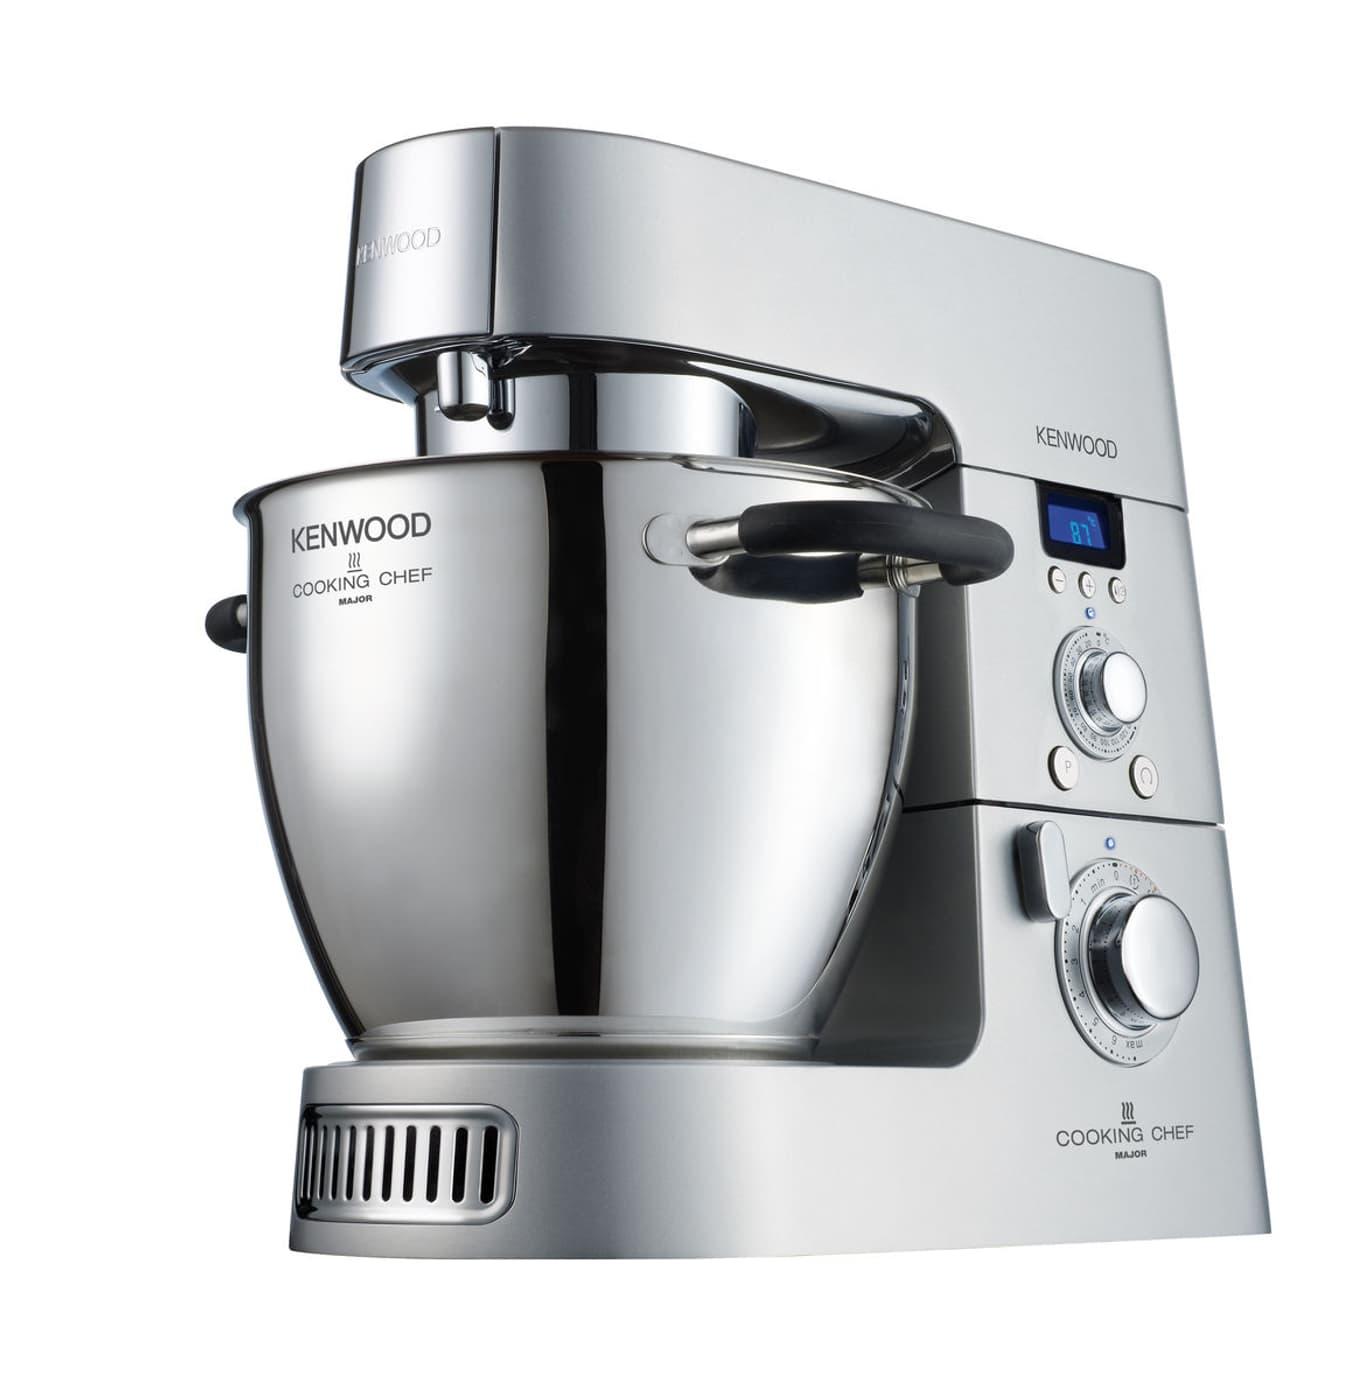 Kenwood KM094 Cooking Chef Robot da cucina | Migros